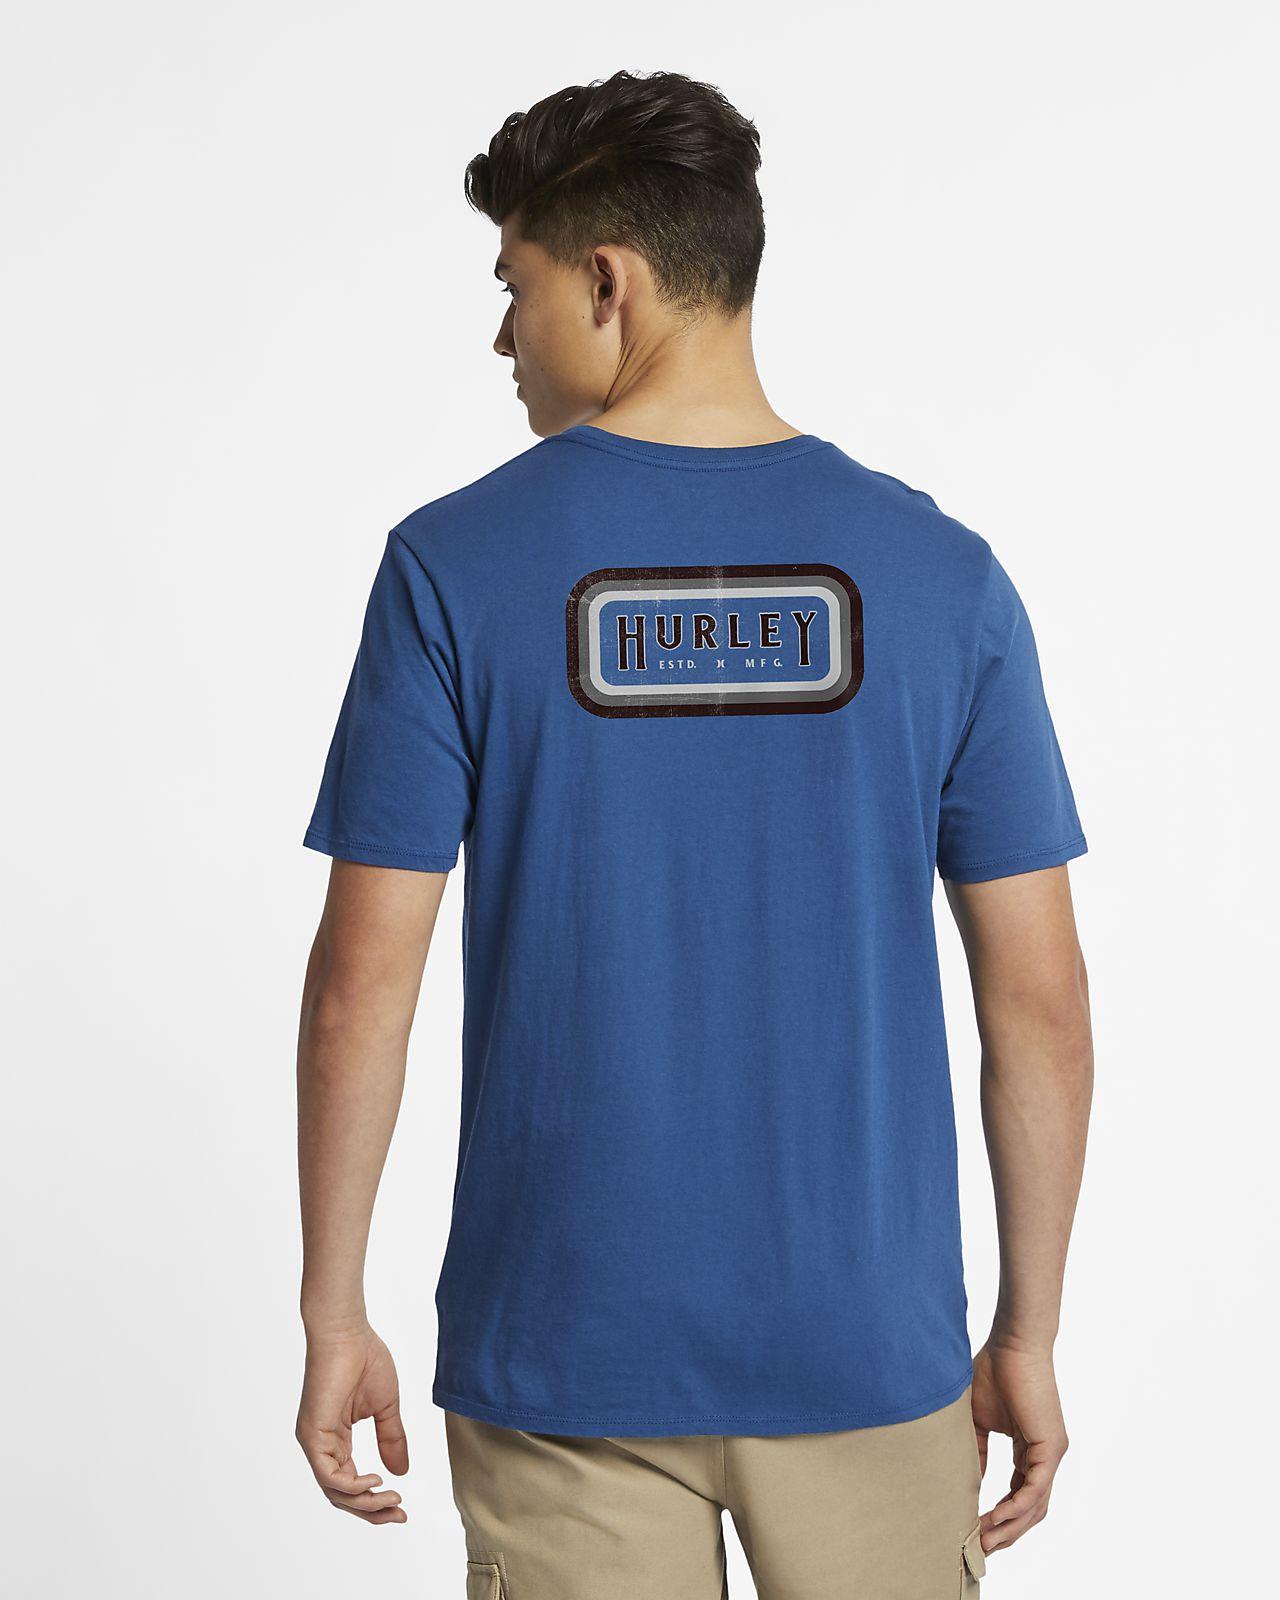 Hurley Breaker Men's T-Shirt